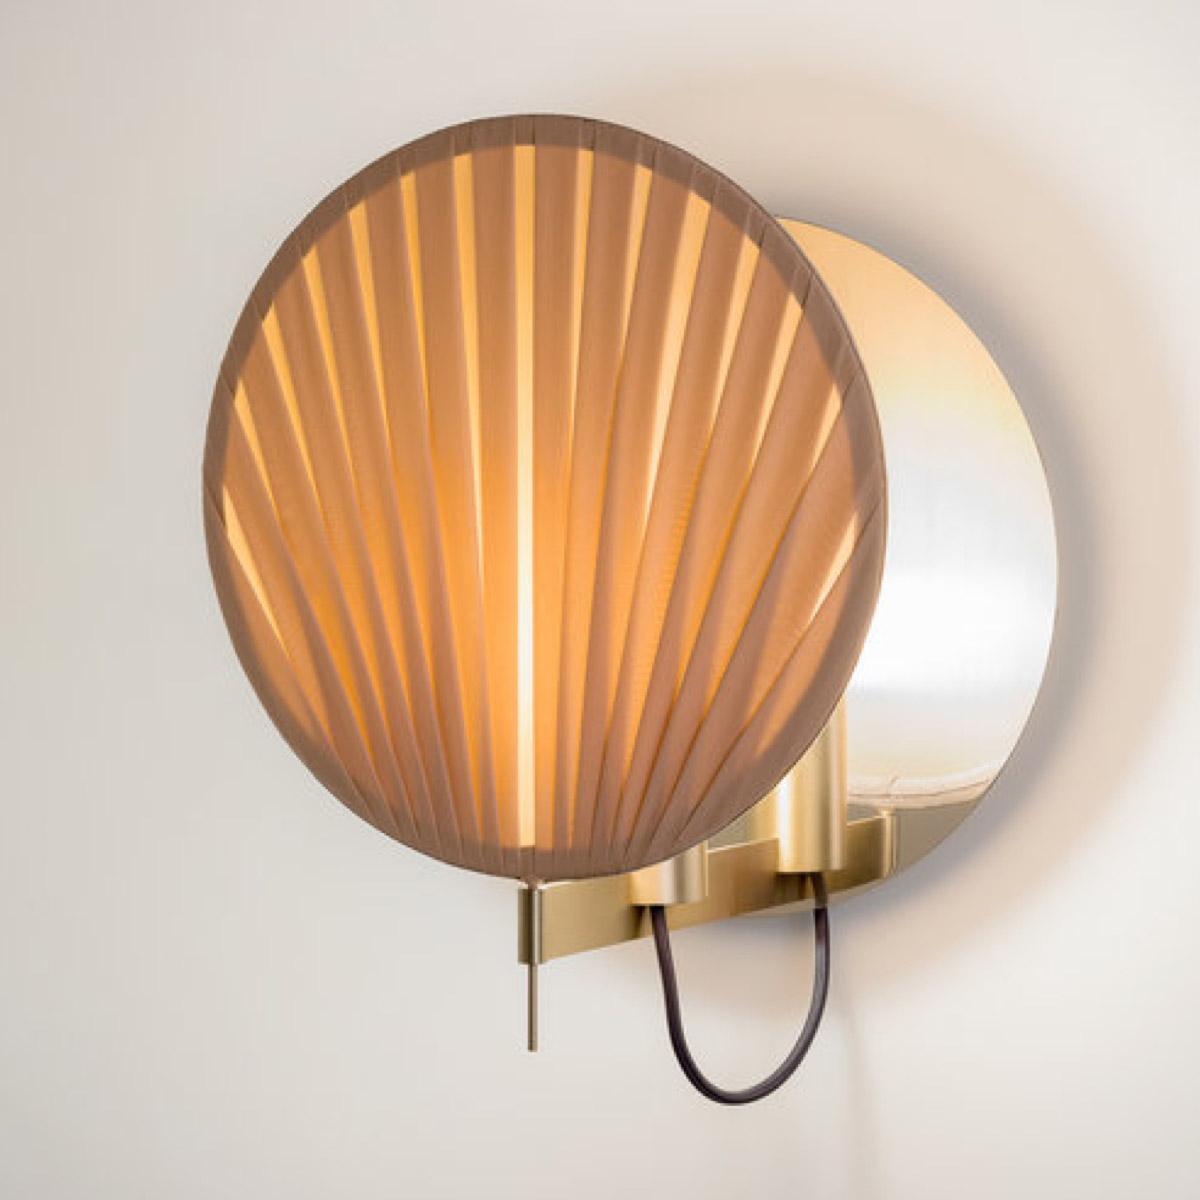 Guinea #5 wall lamp